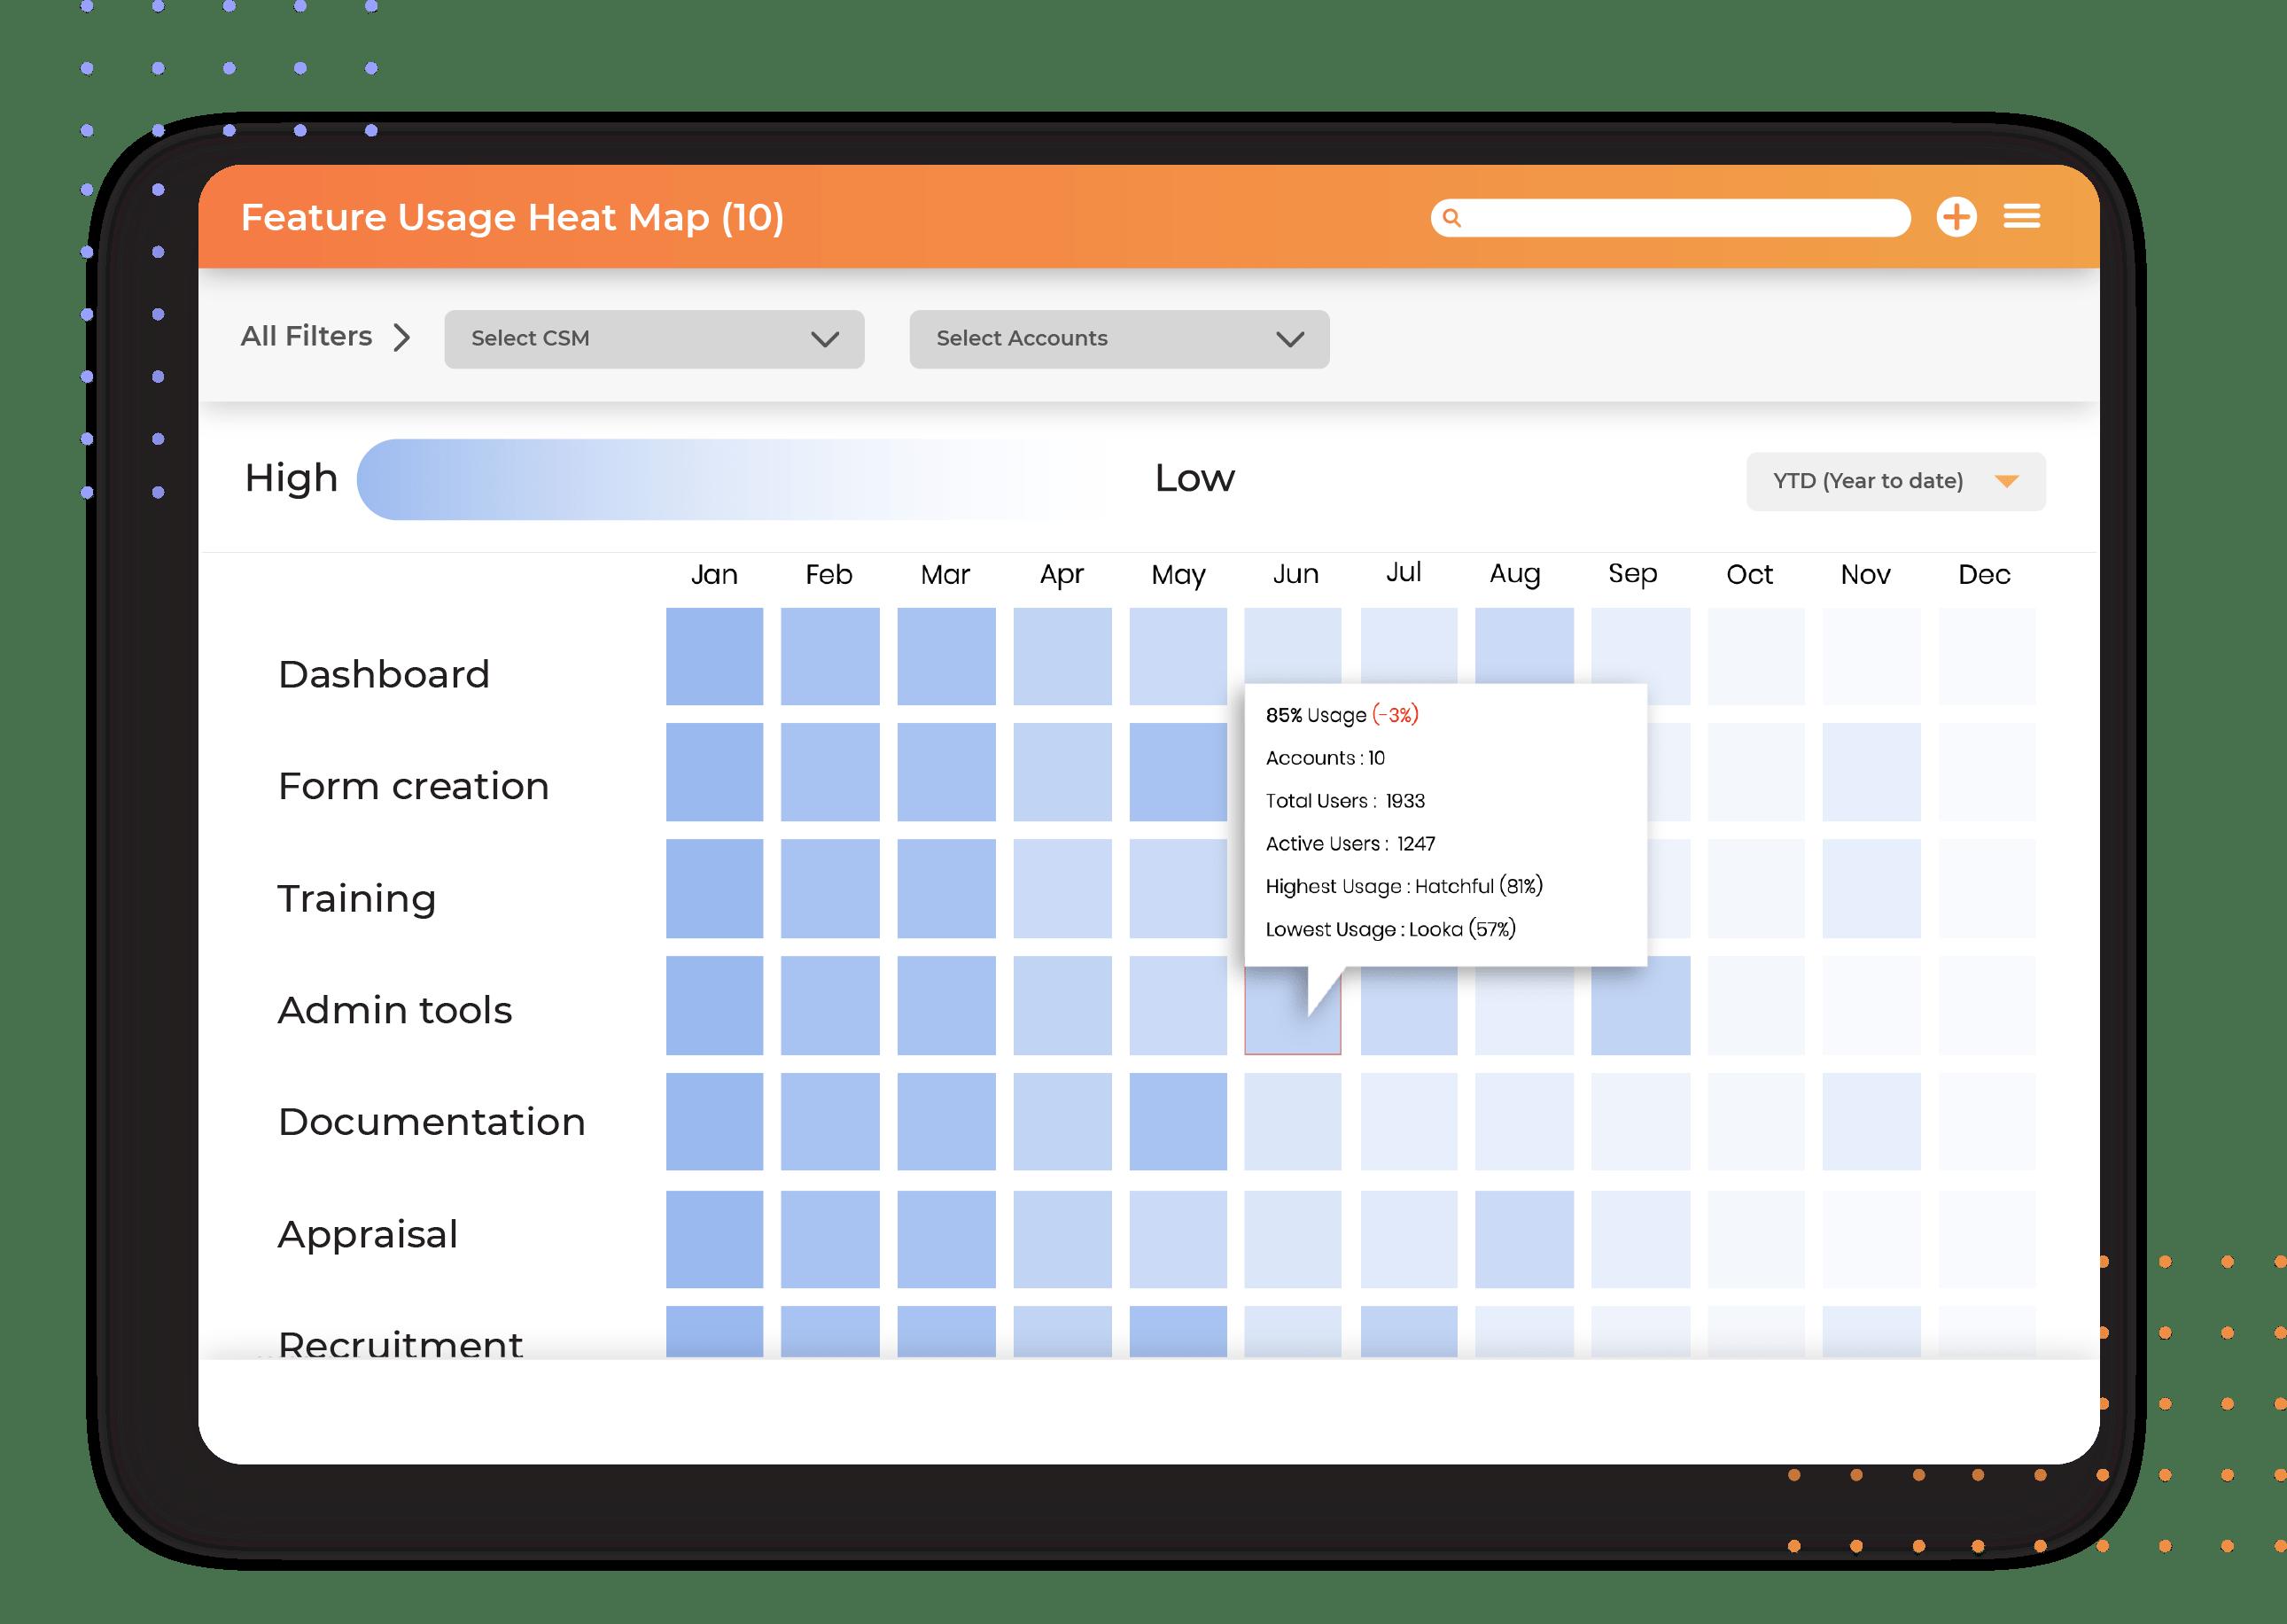 Product adoption feature heatmap